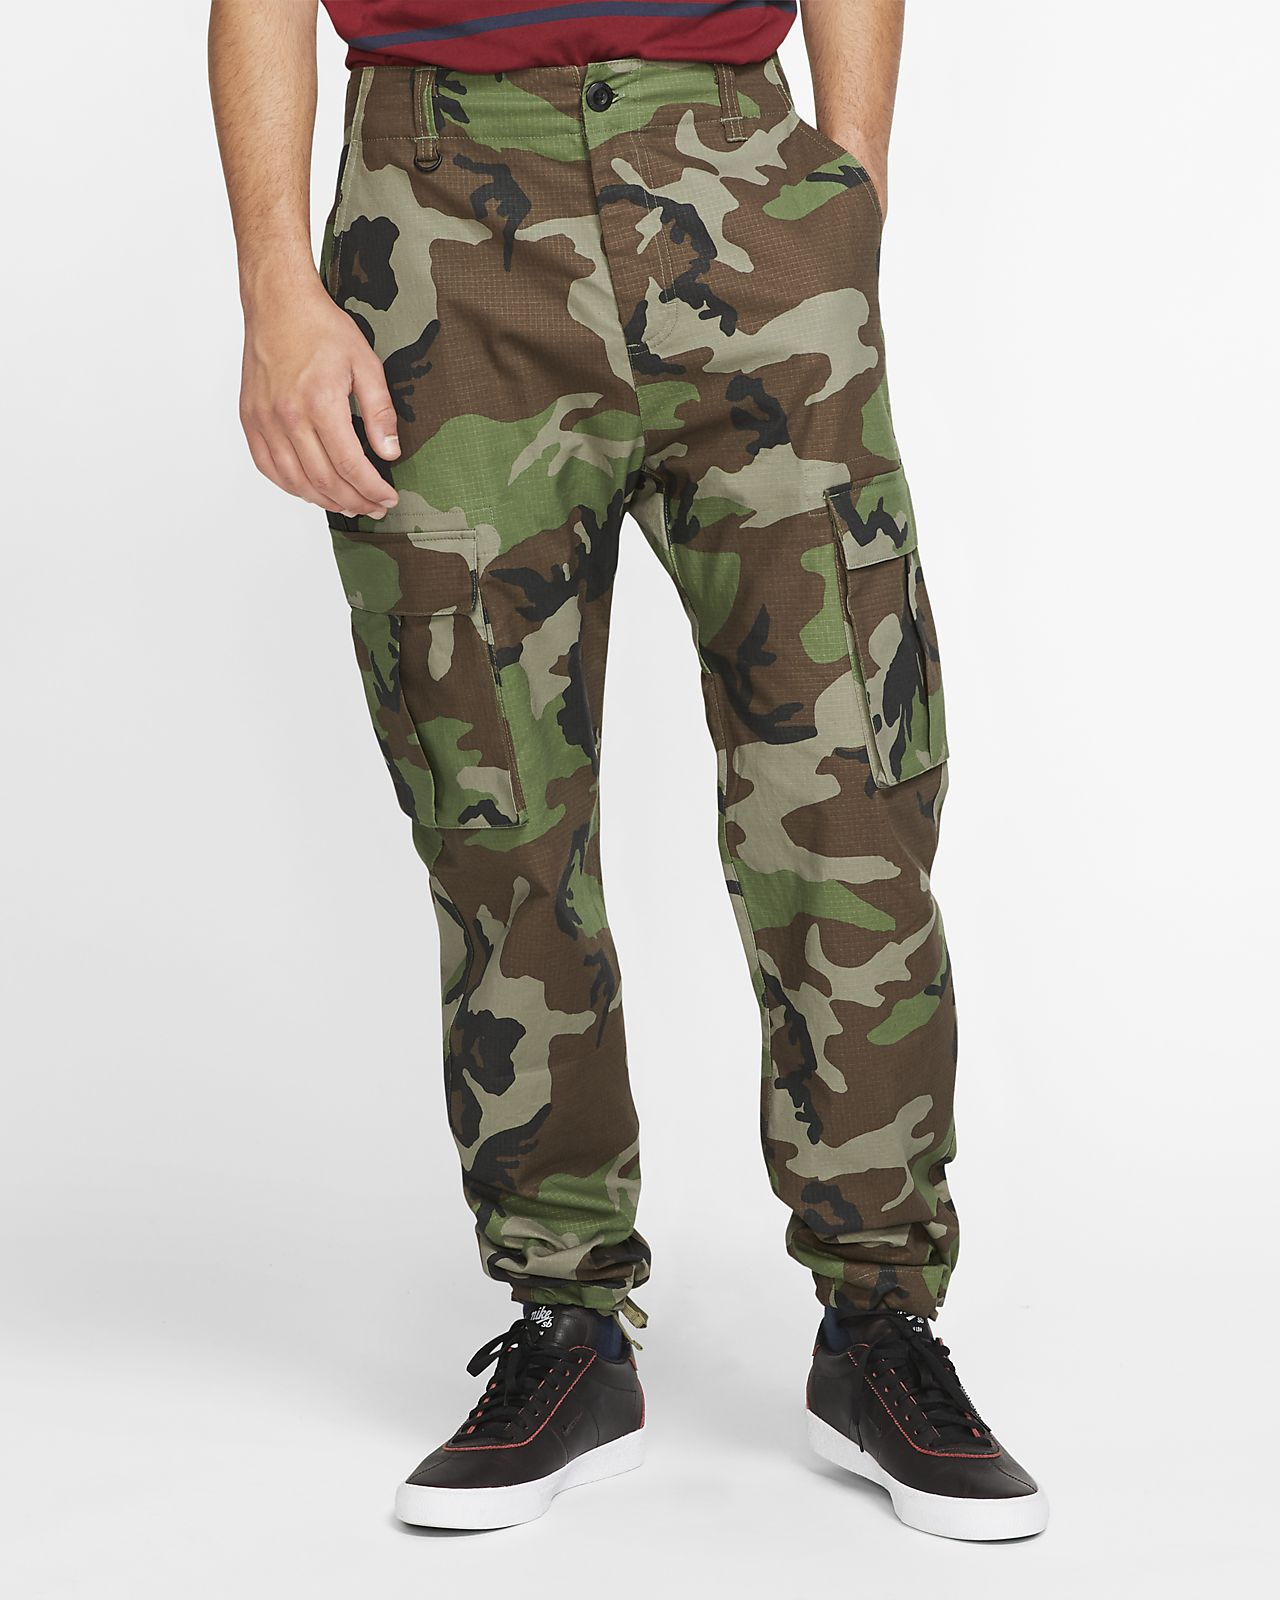 Pantaloni cargo da skateboard camo Nike SB Flex FTM Uomo